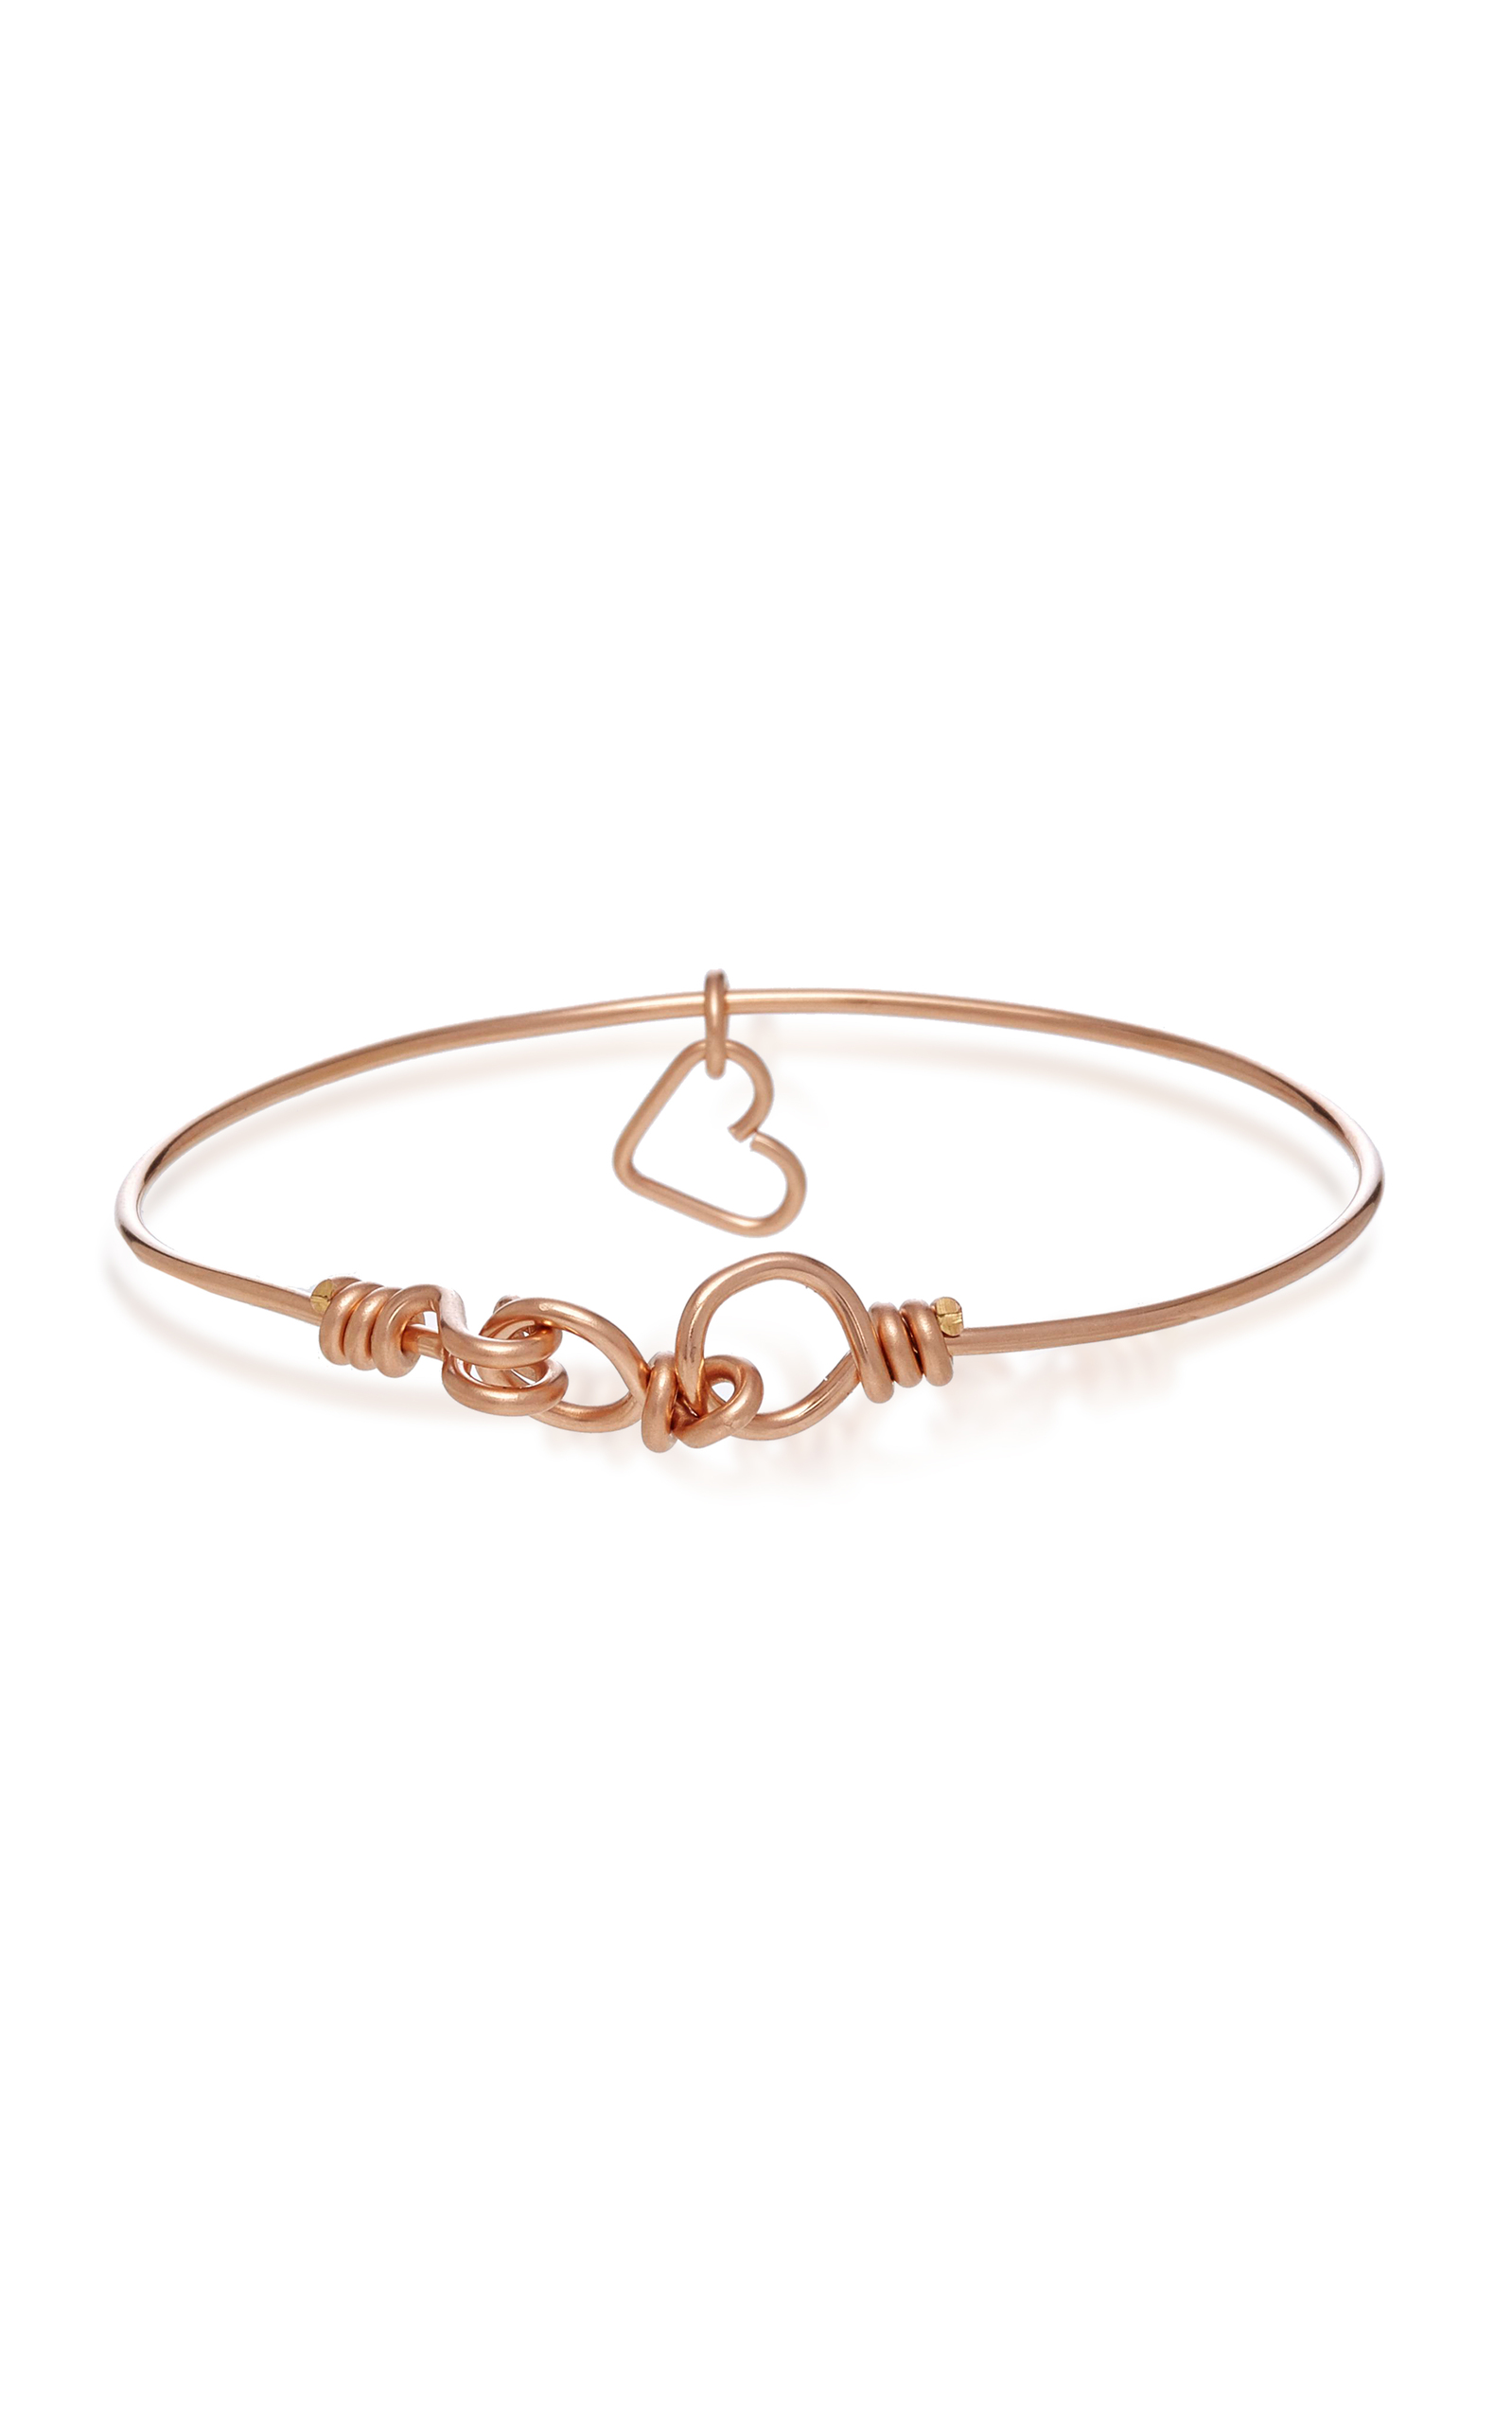 Nude 14K Rose Gold Heart Charm Bracelet Atelier Paulin 6Q1qeh